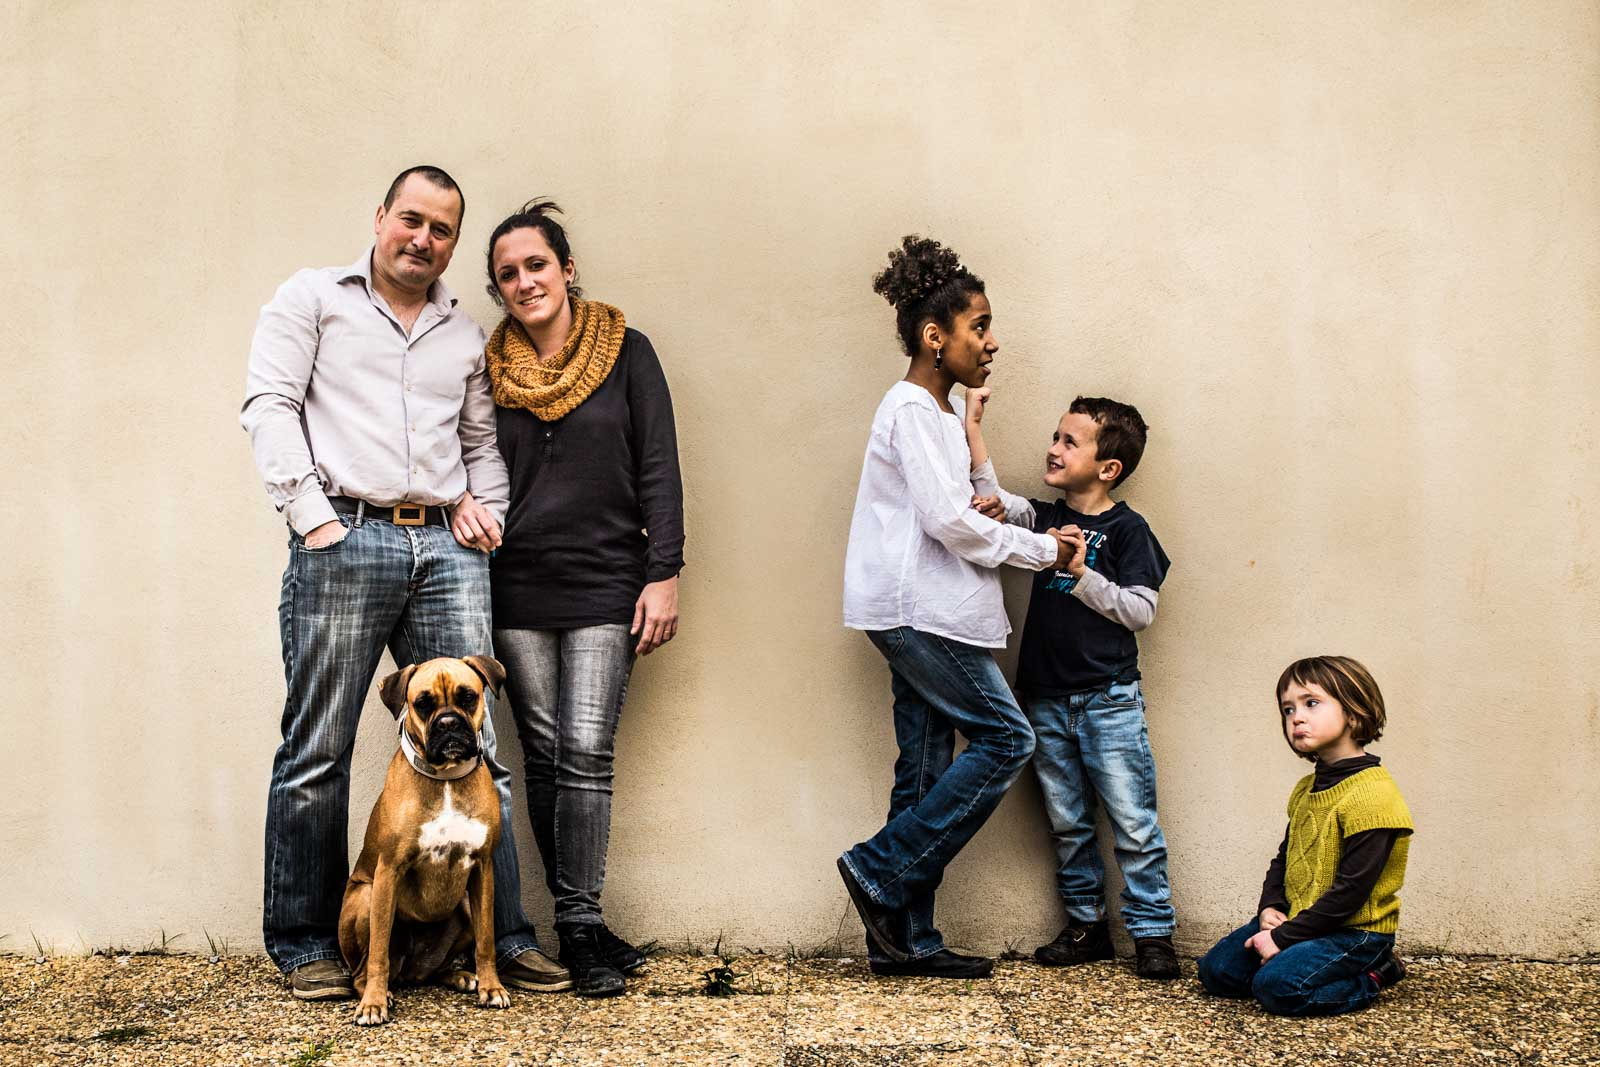 photographe professionnel-famille